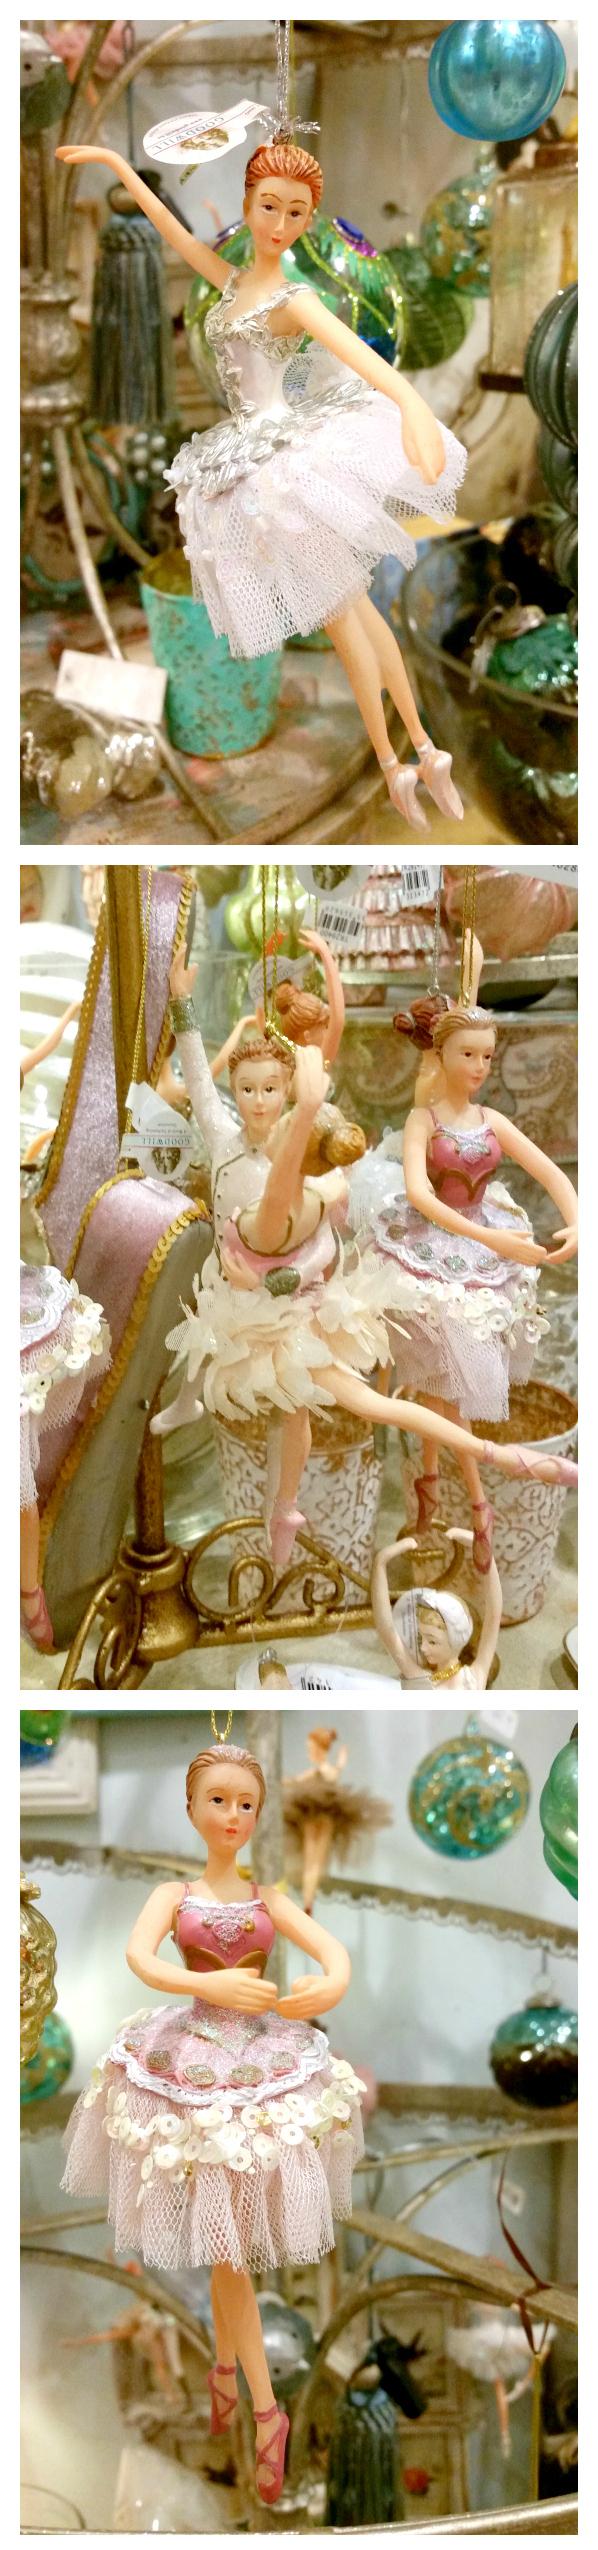 Ballerina-Collage-5